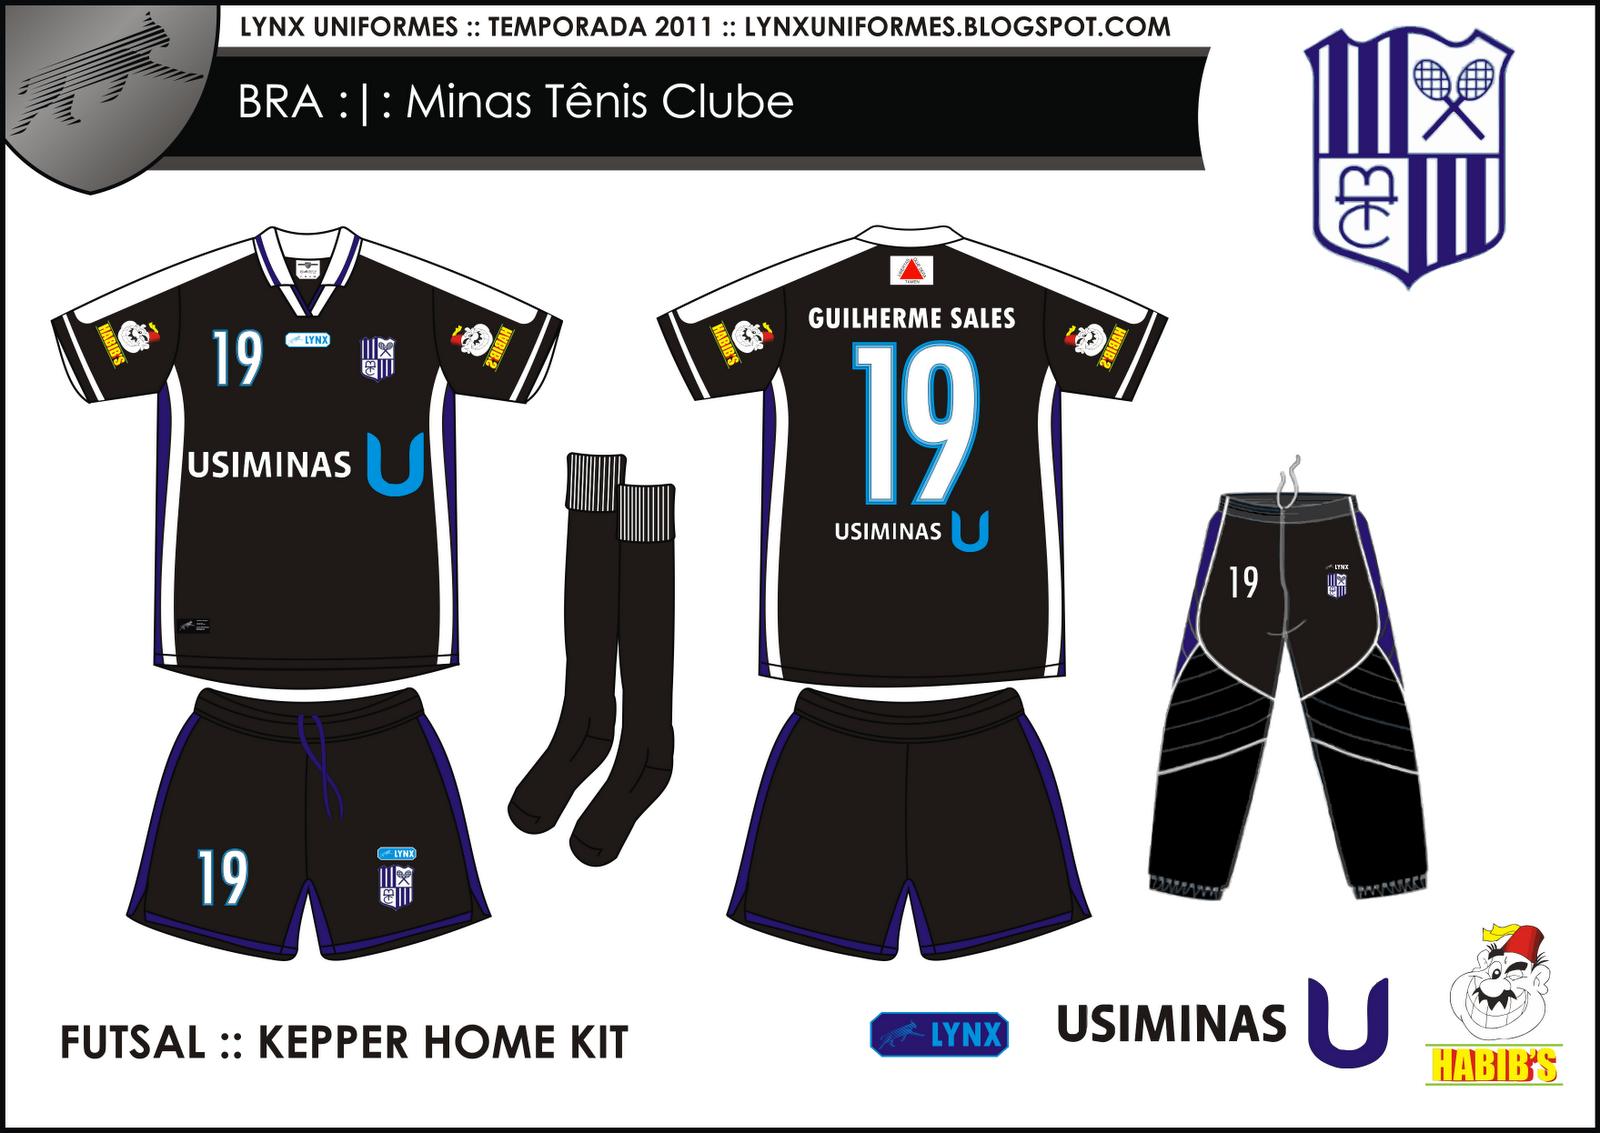 Minas tenis clube futsal